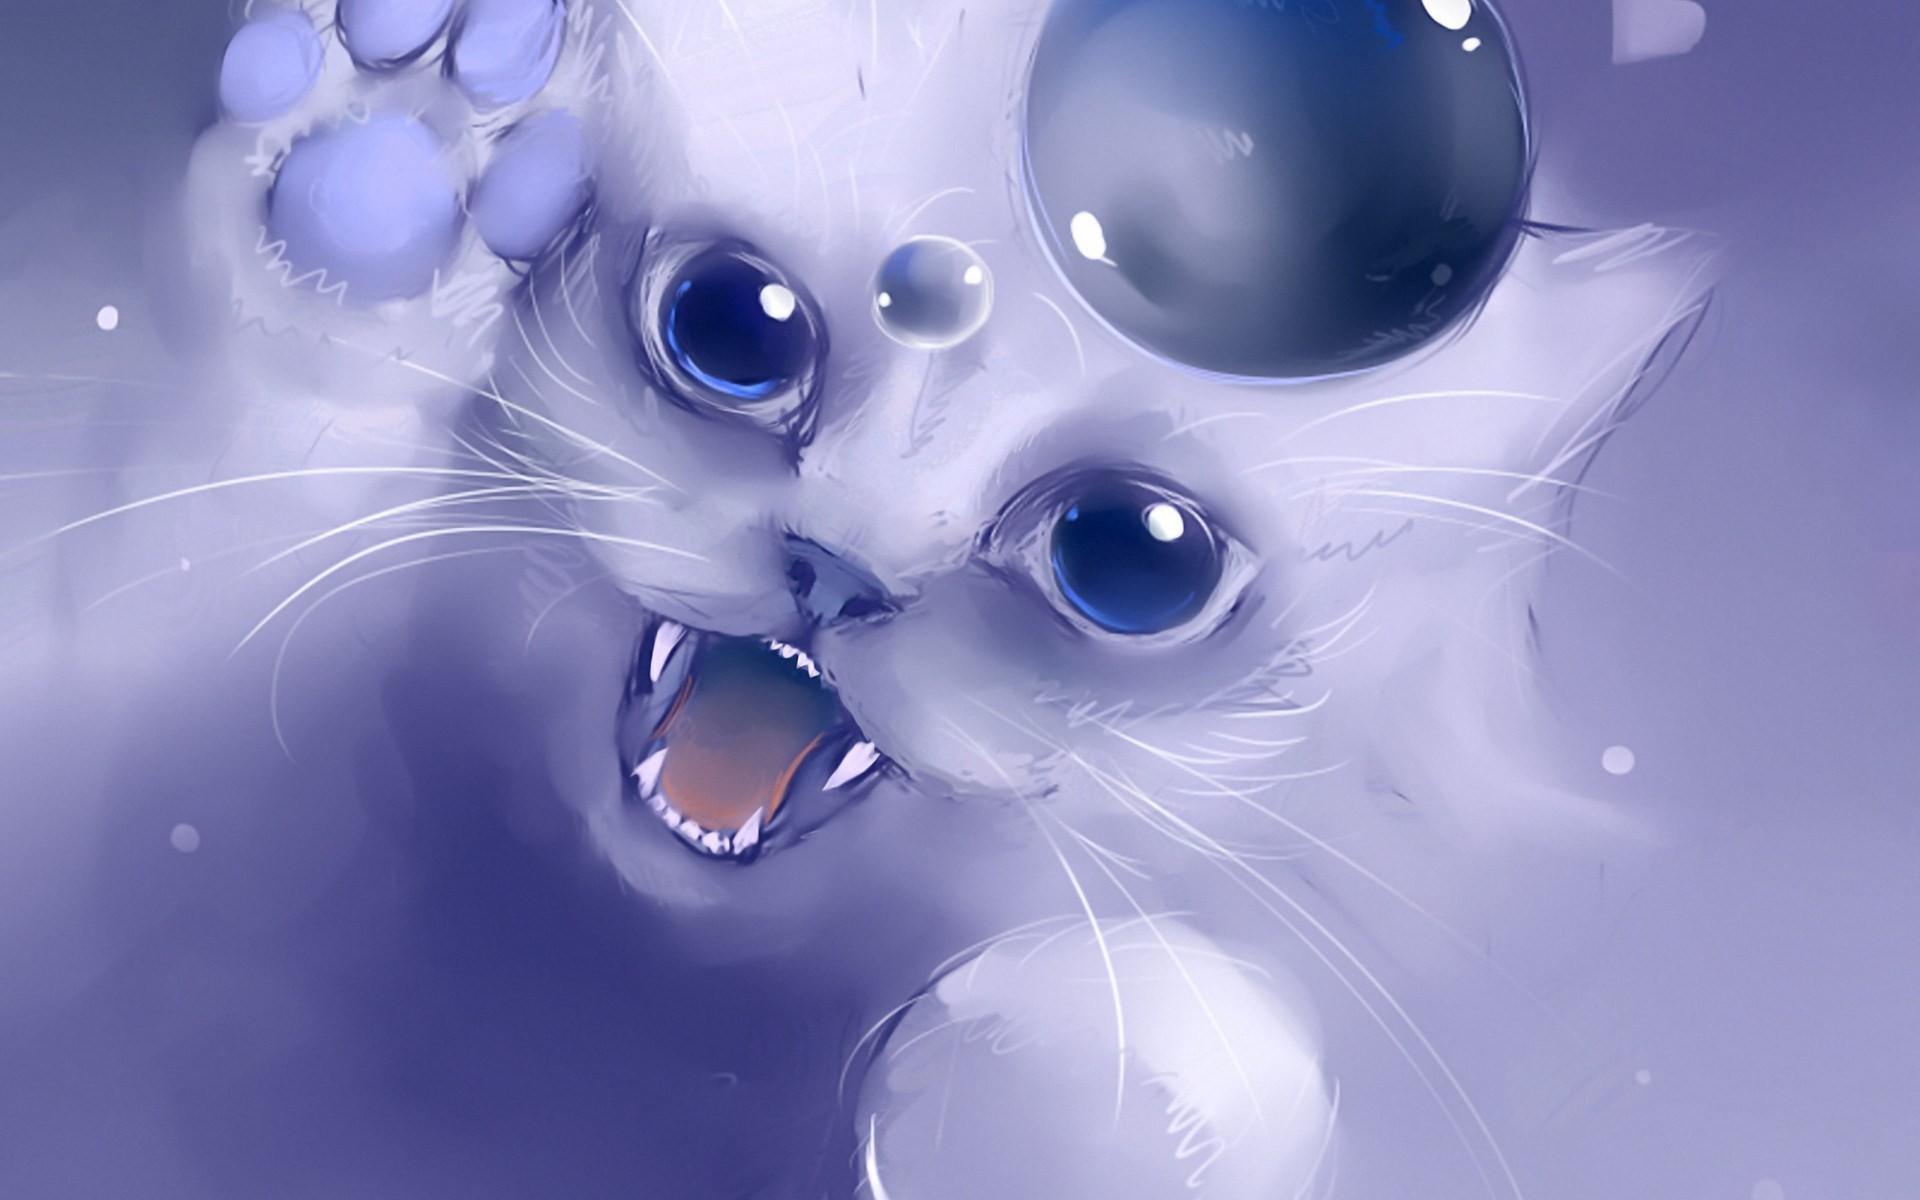 cat artwork hd wallpaper